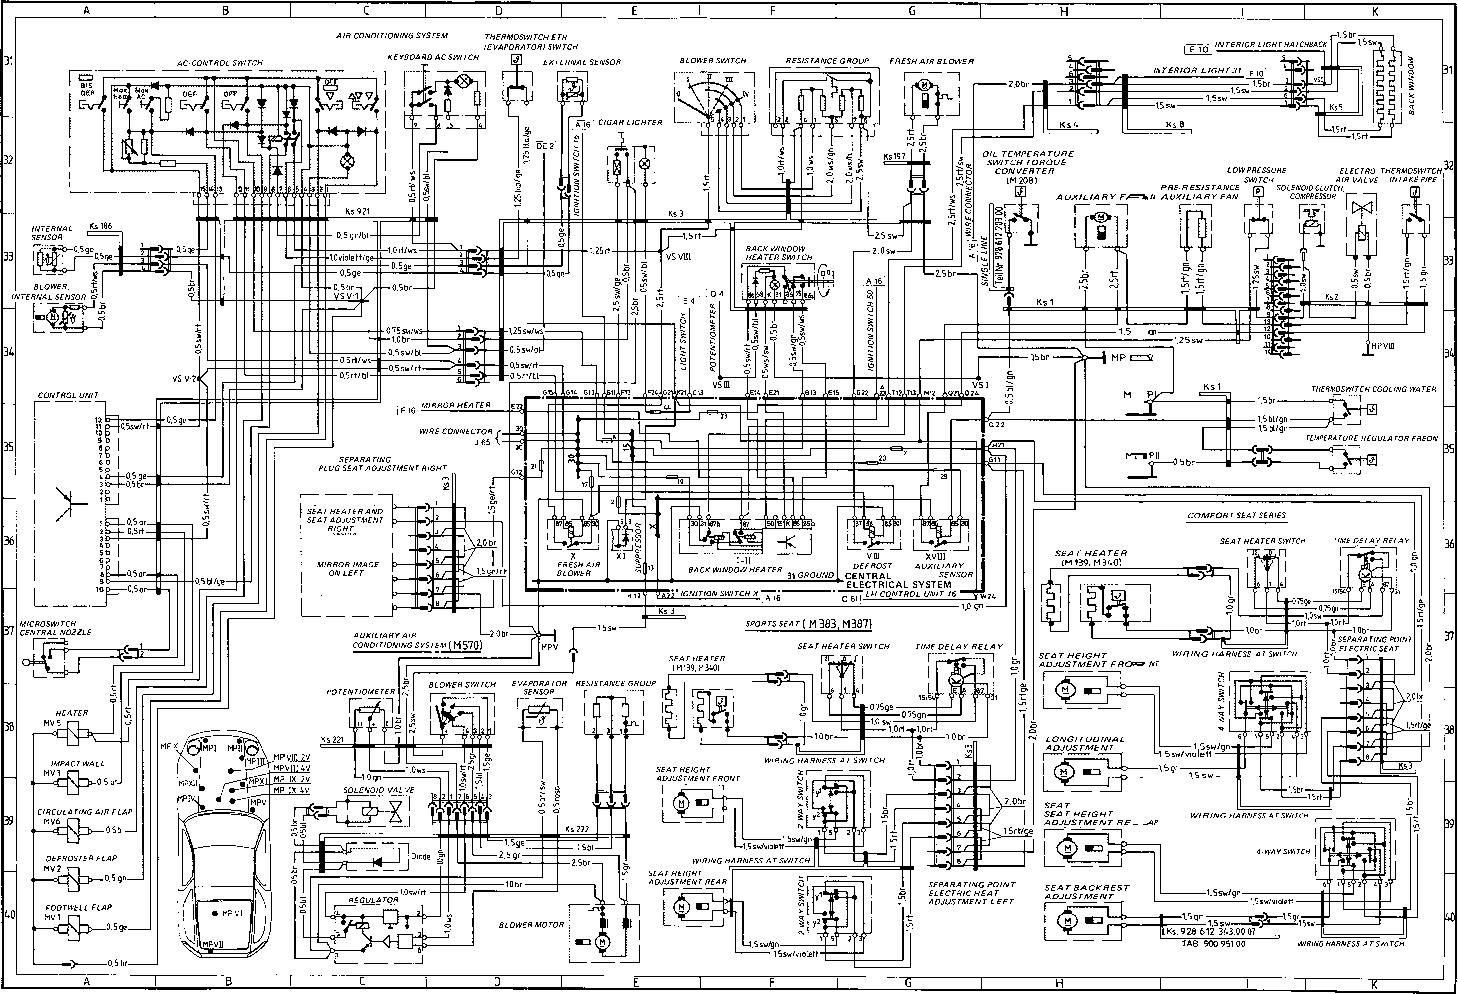 porsche 914 wiring diagram porsche 914 6 wiring diagram full color laminated 18 x 24 1975 porsche 914 wiring diagram porsche 914 6 wiring diagram full color